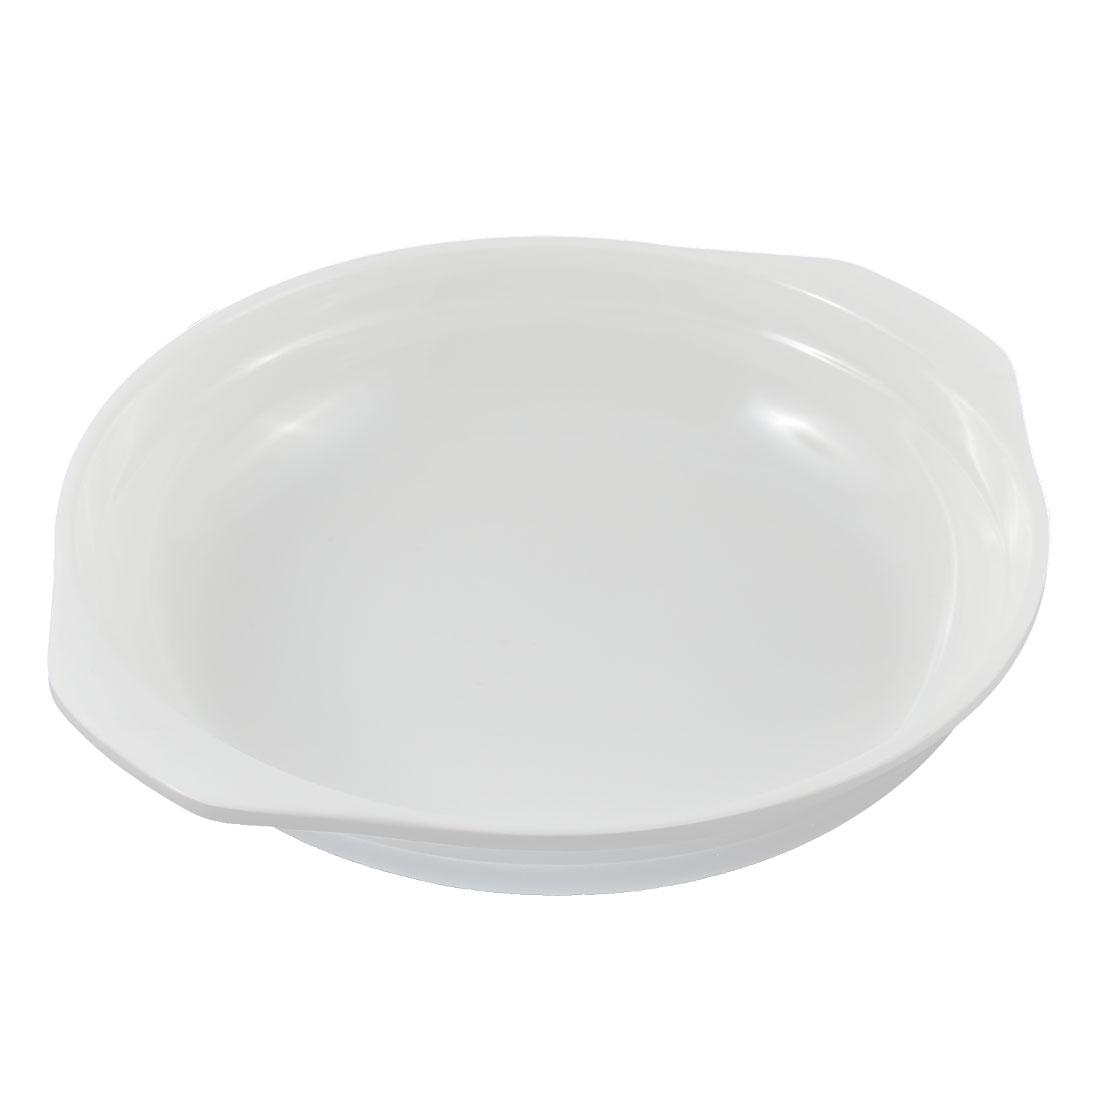 "Restaurant Home Kitchen Plastic Dual Ear Handles Dish Plate White 6"" Dia"